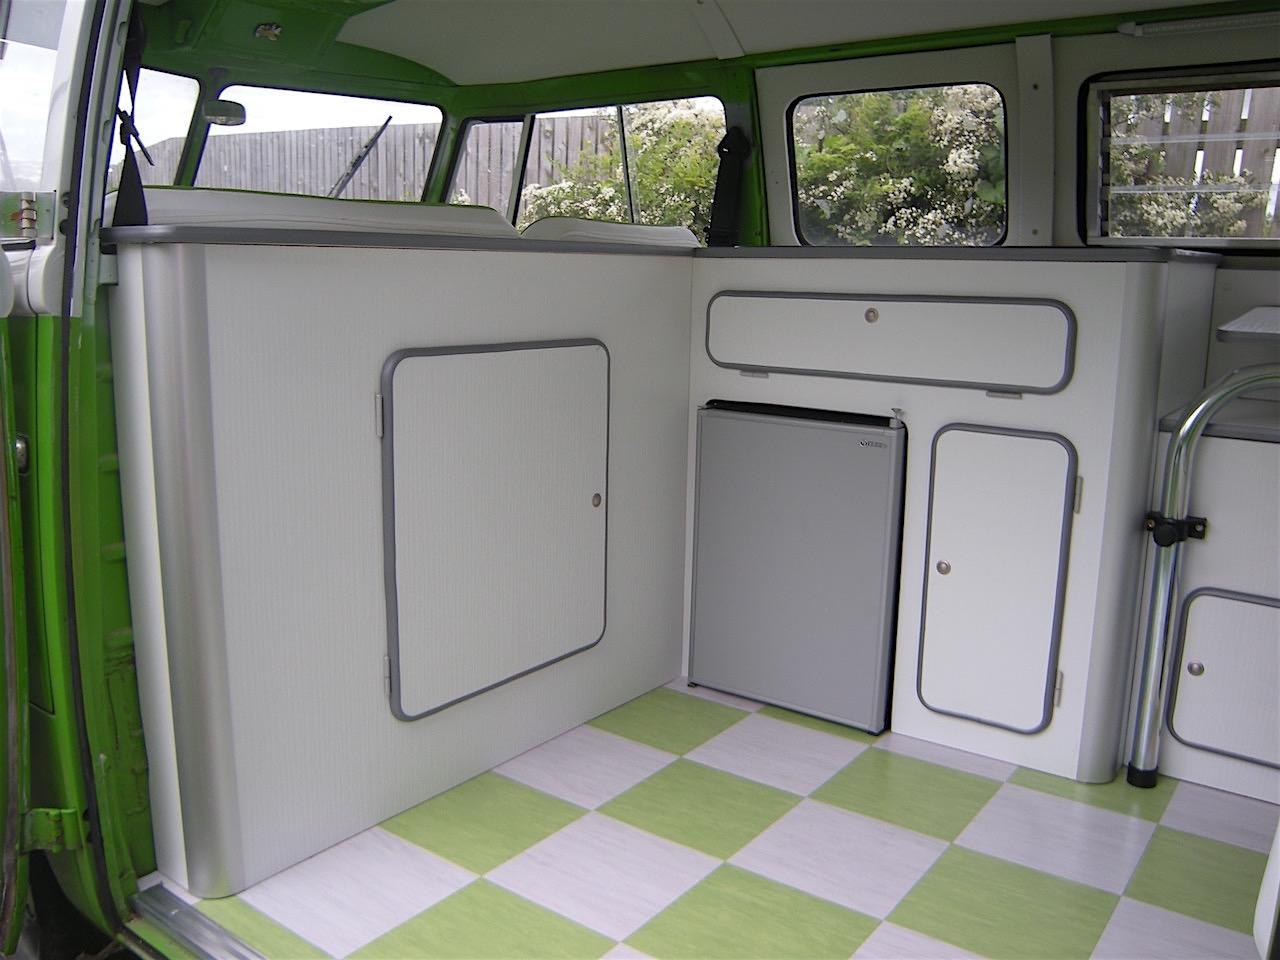 split screen interior vw camper interiors. Black Bedroom Furniture Sets. Home Design Ideas